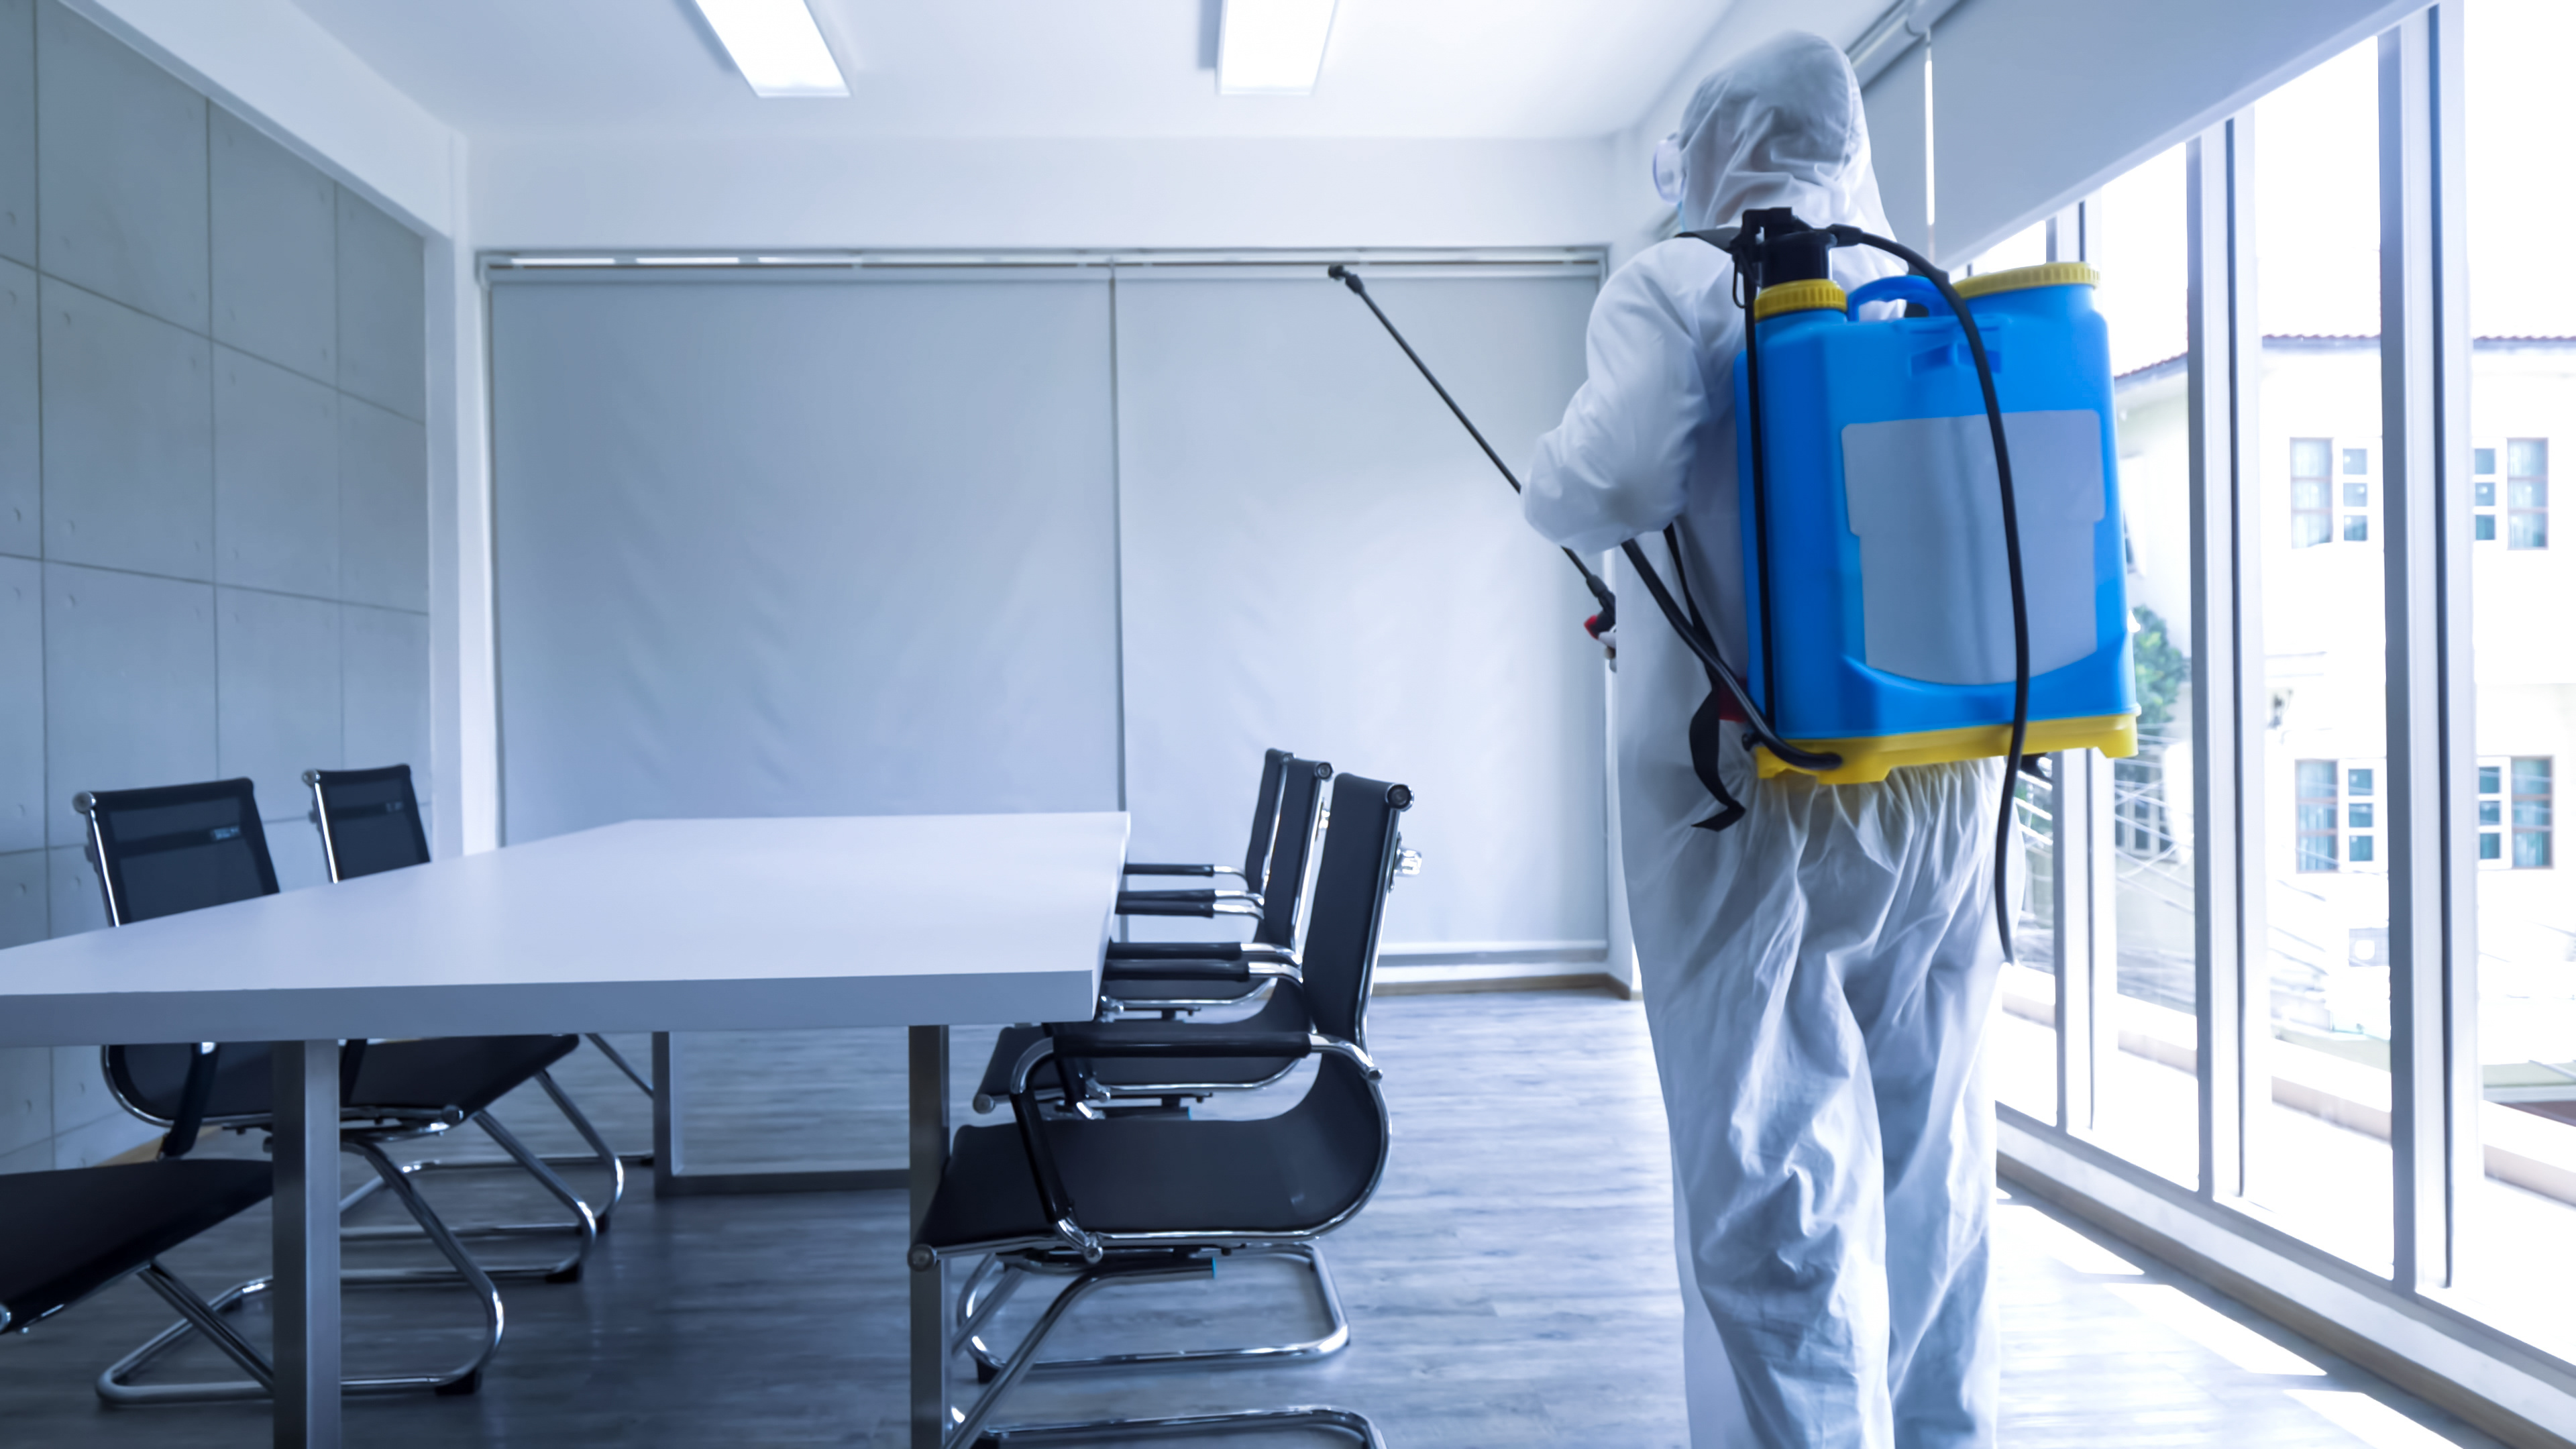 Elite Advance disinfection services